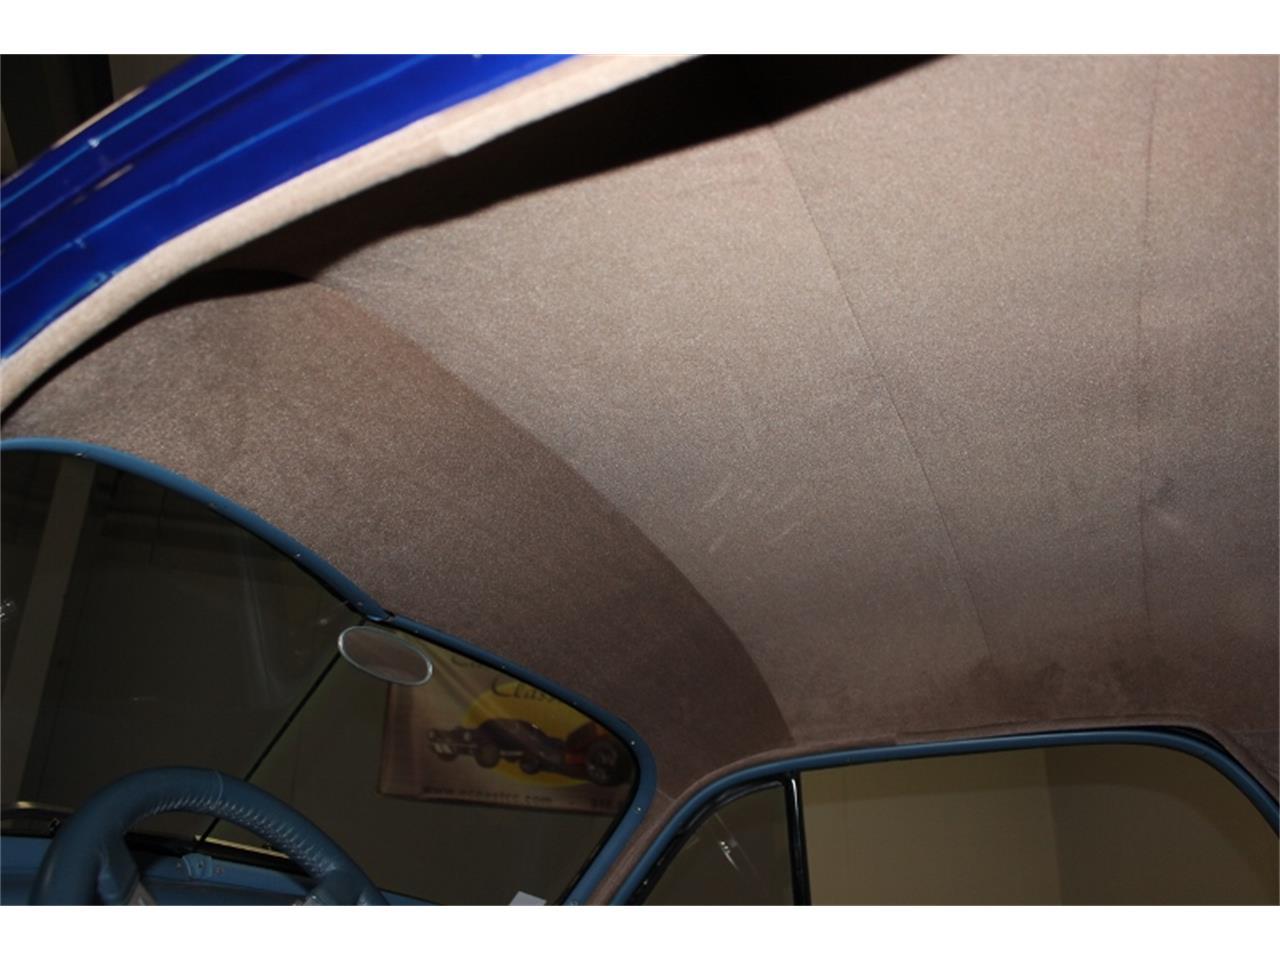 Large Picture of Classic 1947 Chevrolet Fleetline located in Lillington North Carolina - $37,000.00 - L40K